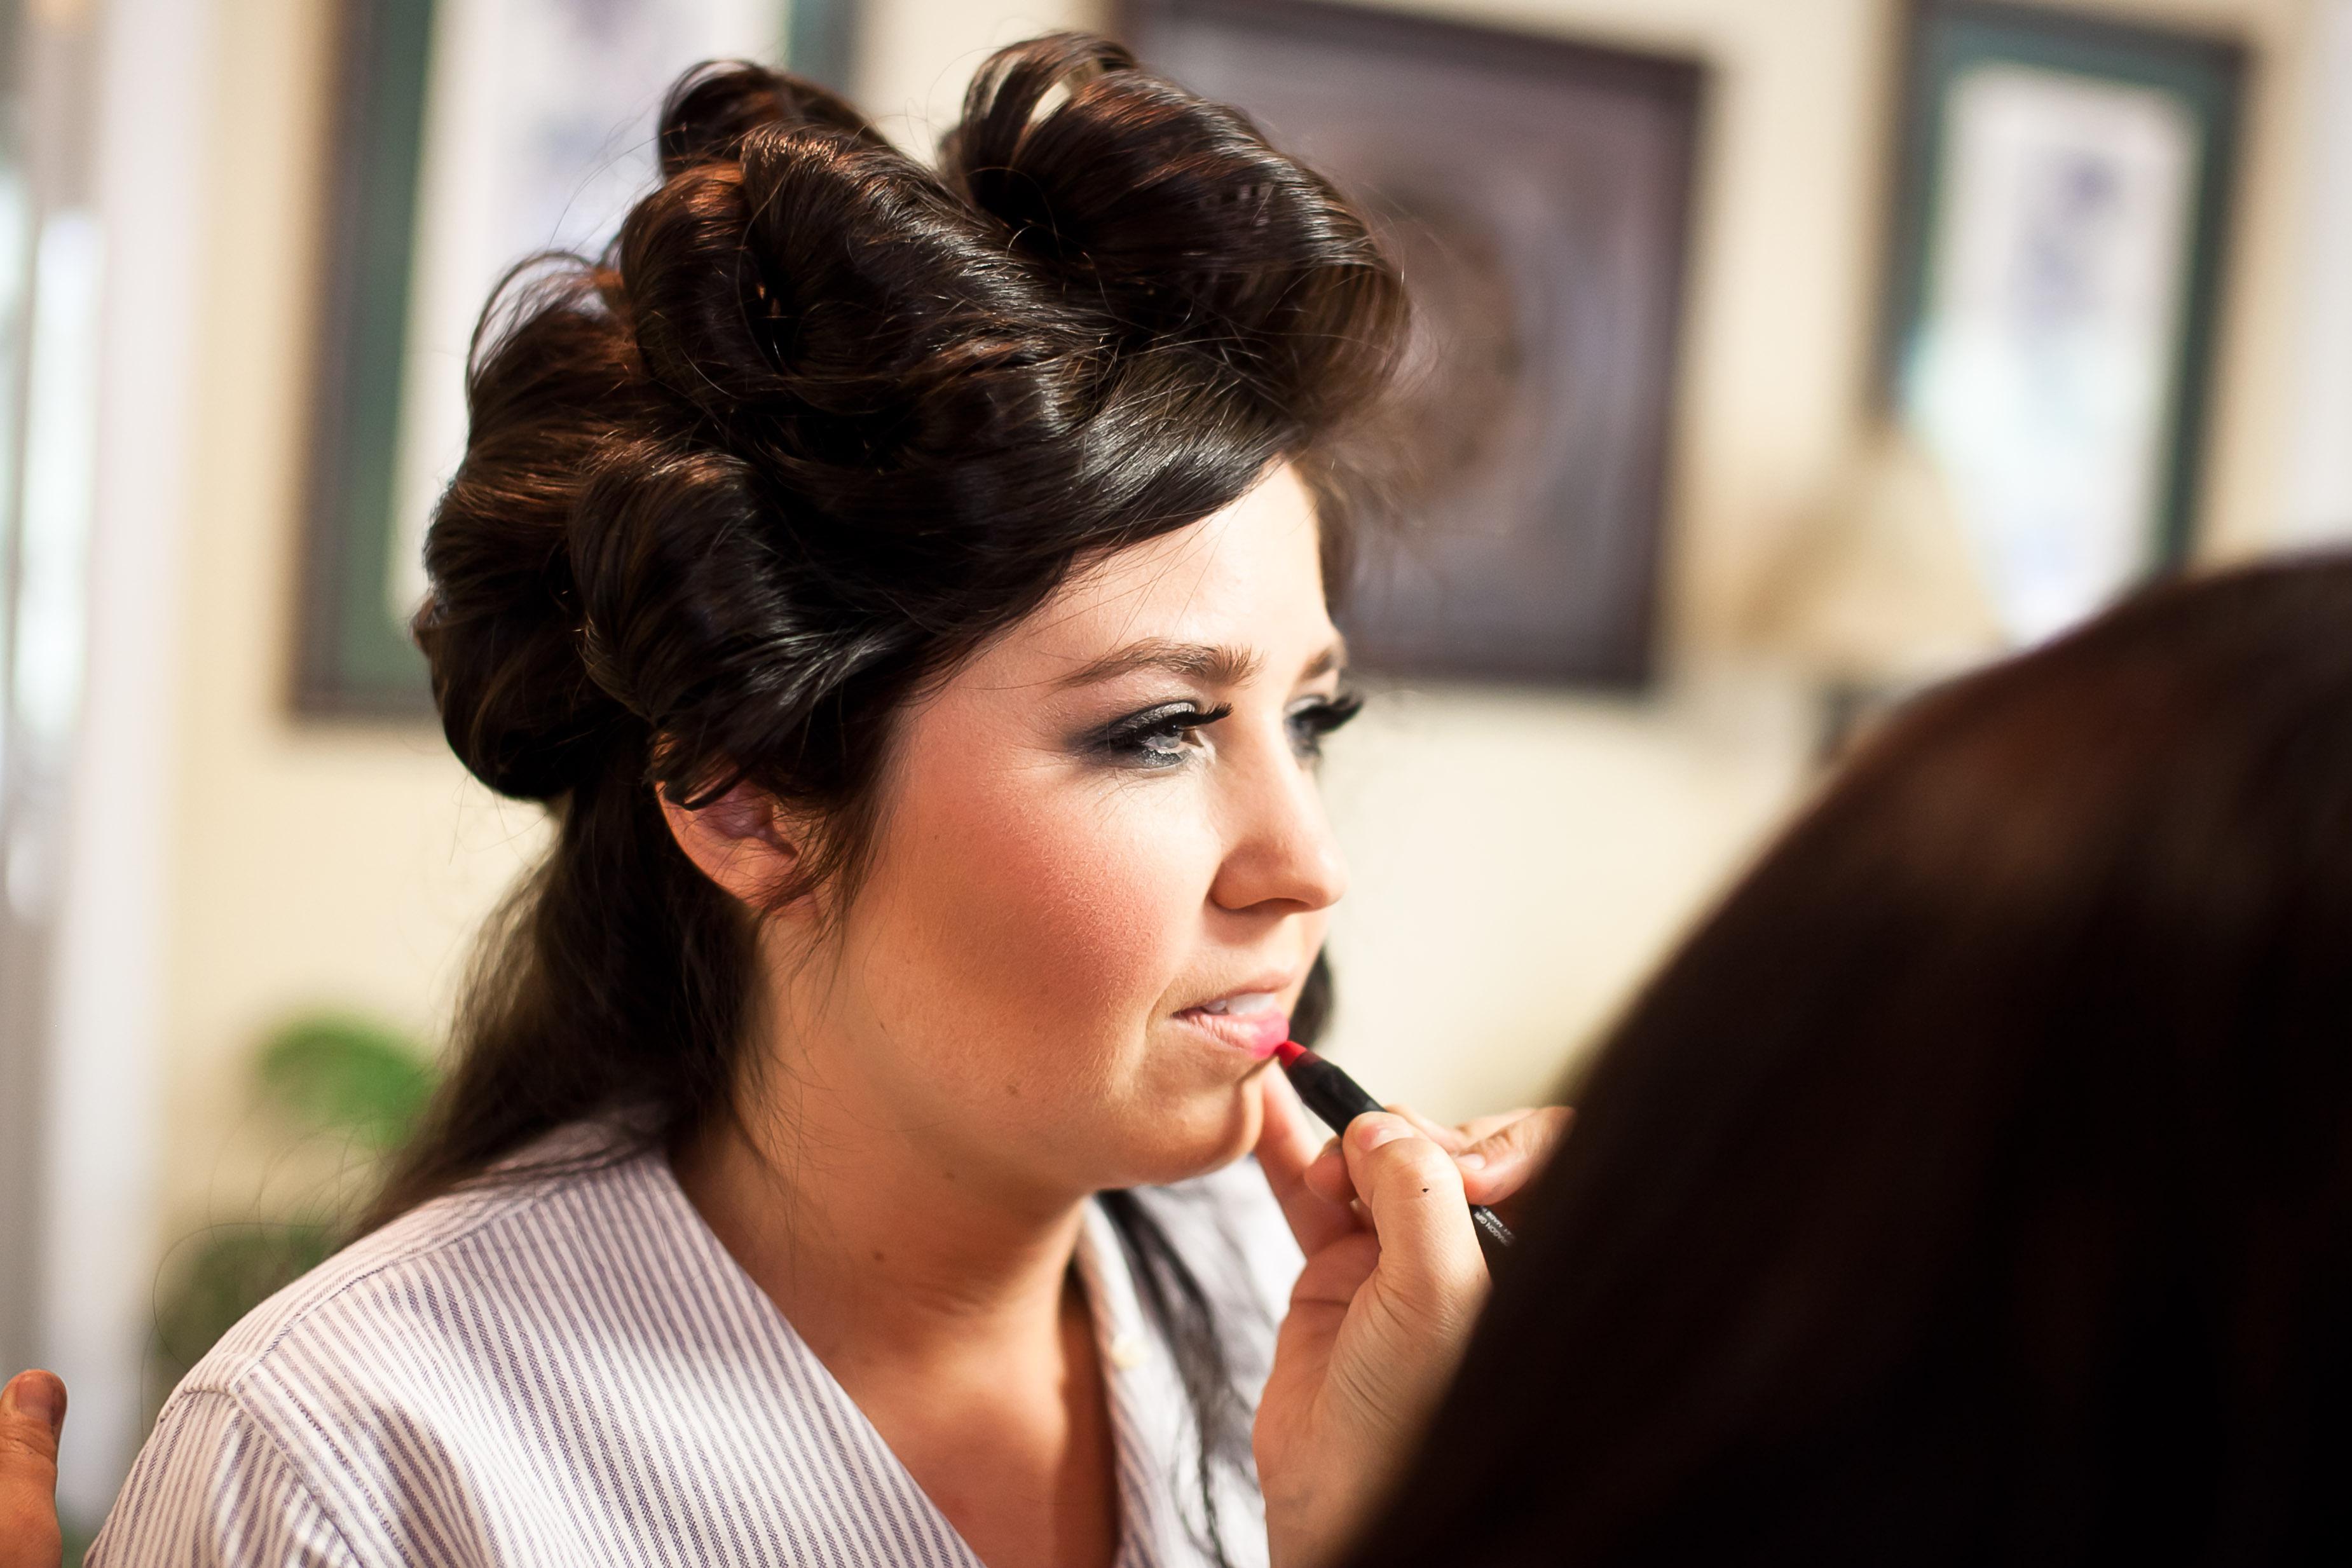 Airbrush, Dan klutz photography, Jen paulos, Pastel makeup design